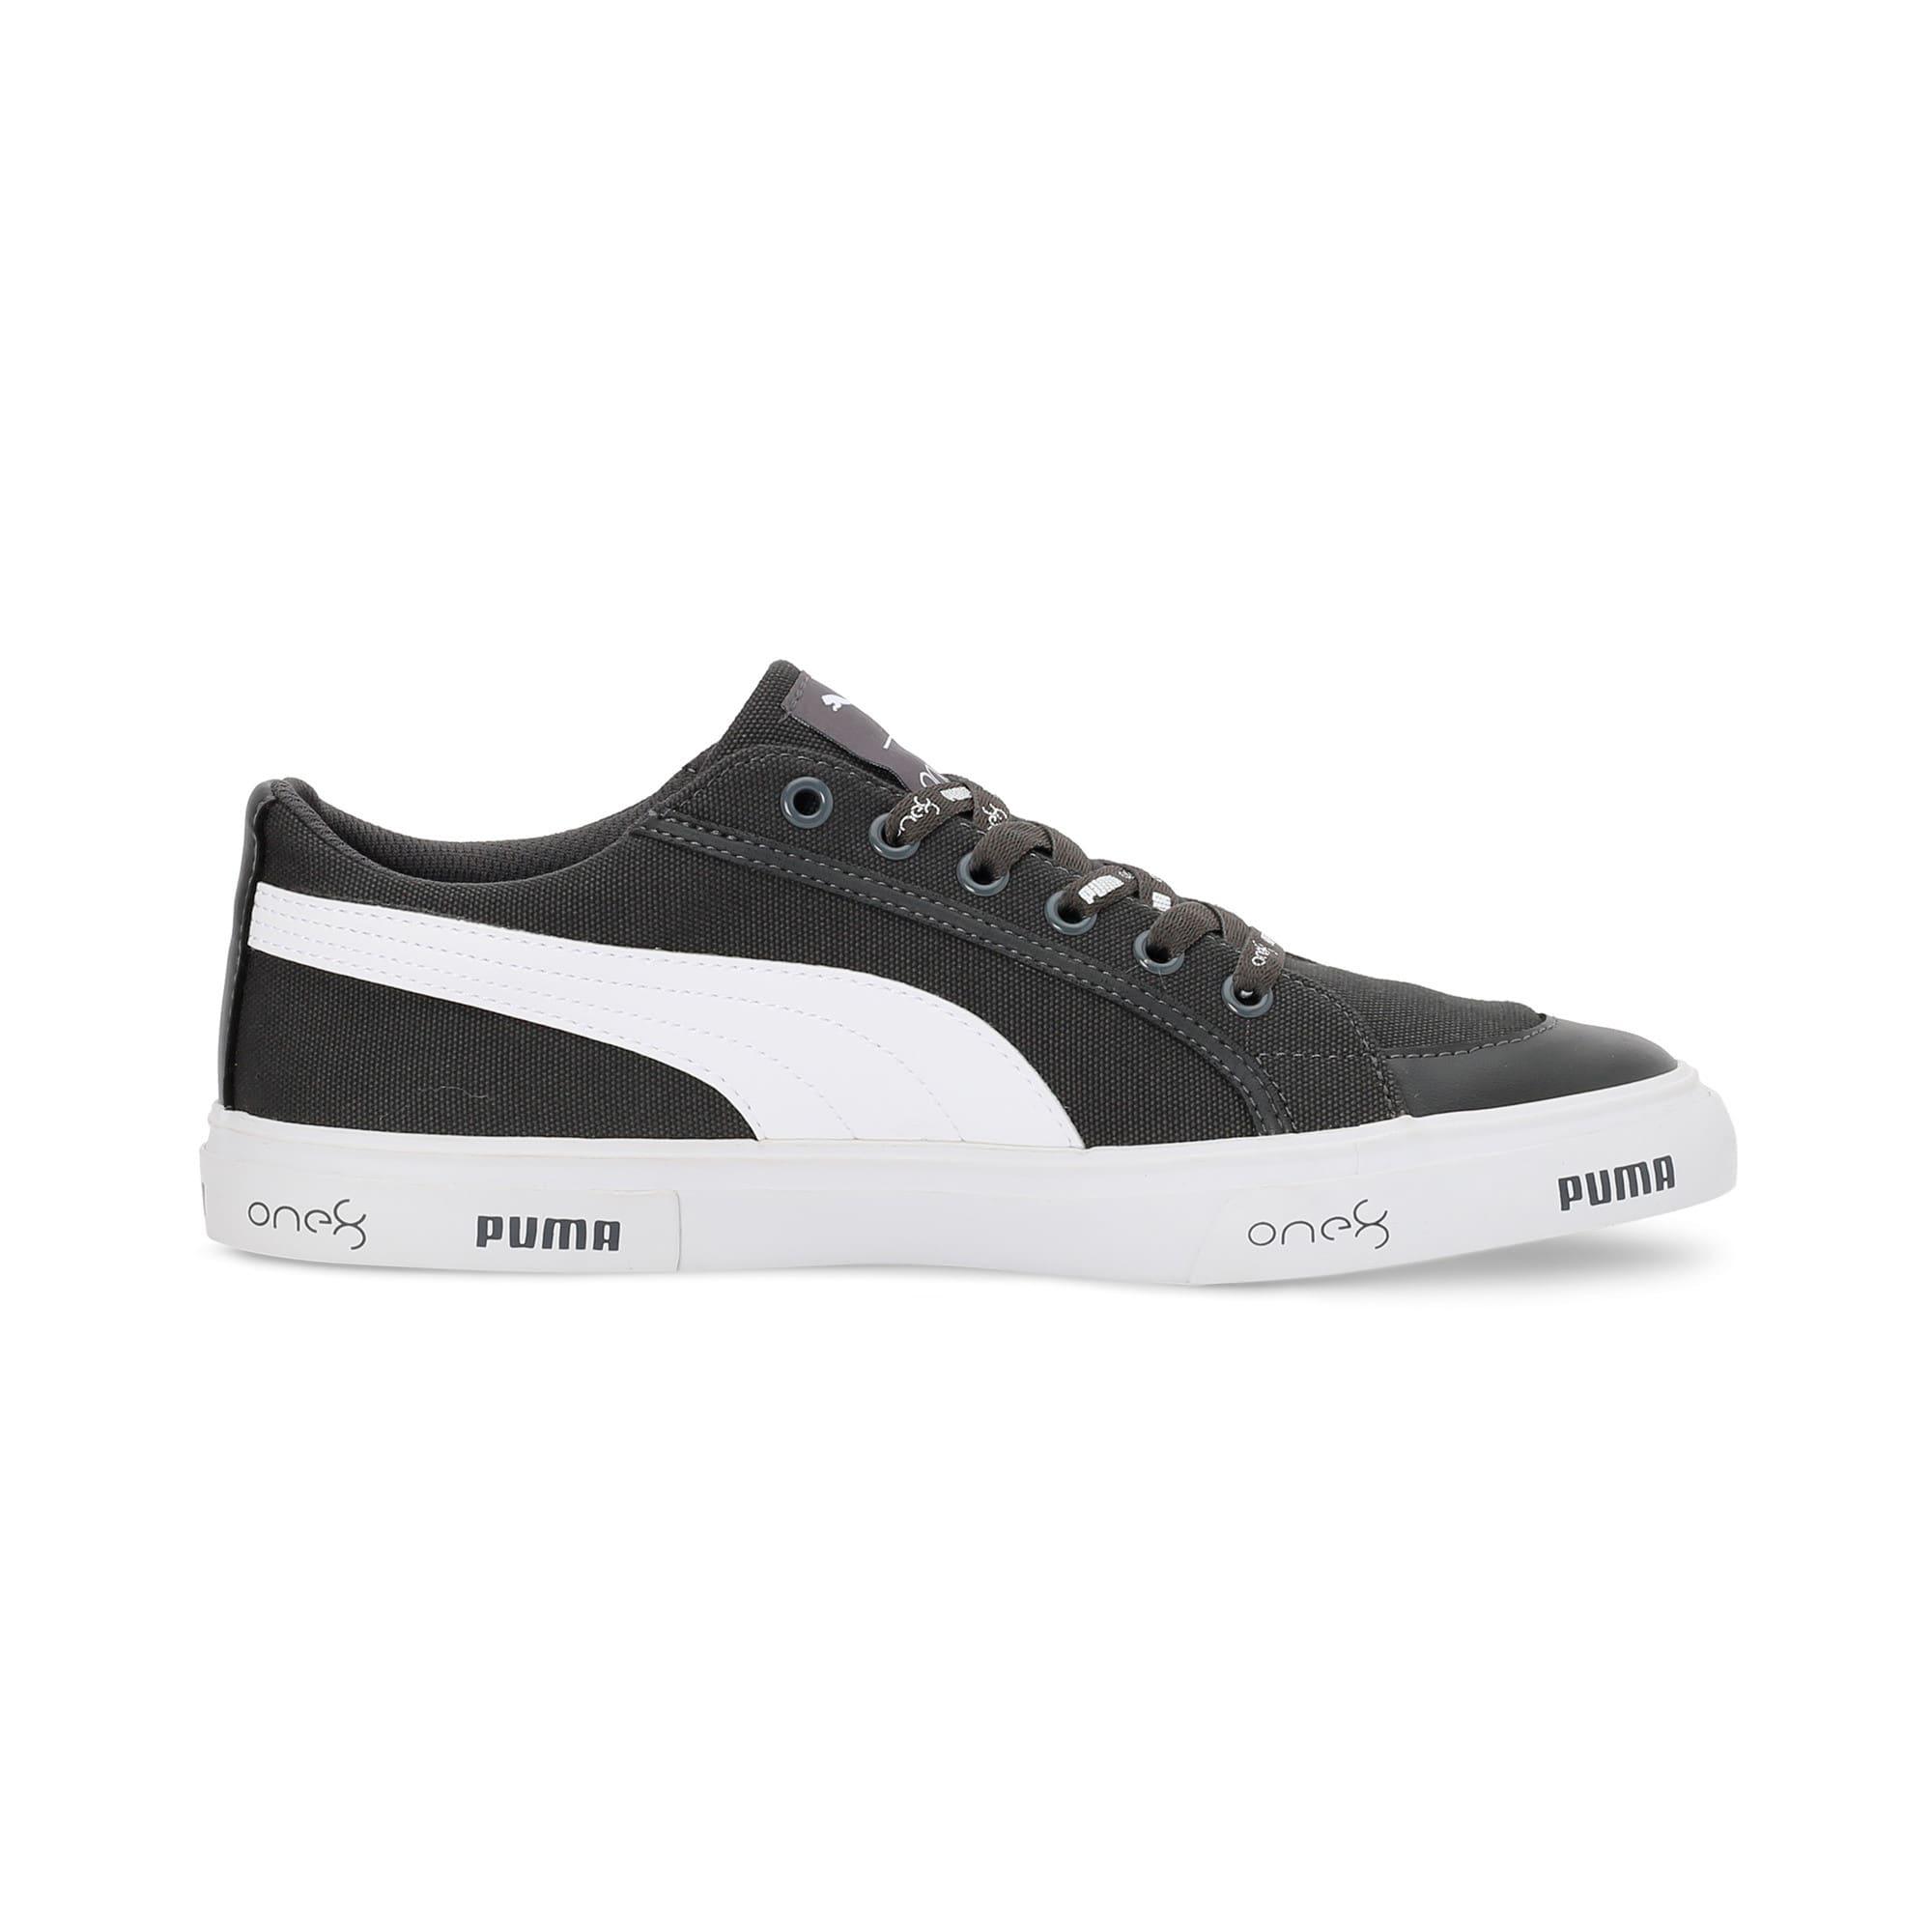 Thumbnail 5 of one8 V2 IDP Men's Sneakers, Iron Gate-Puma White, medium-IND